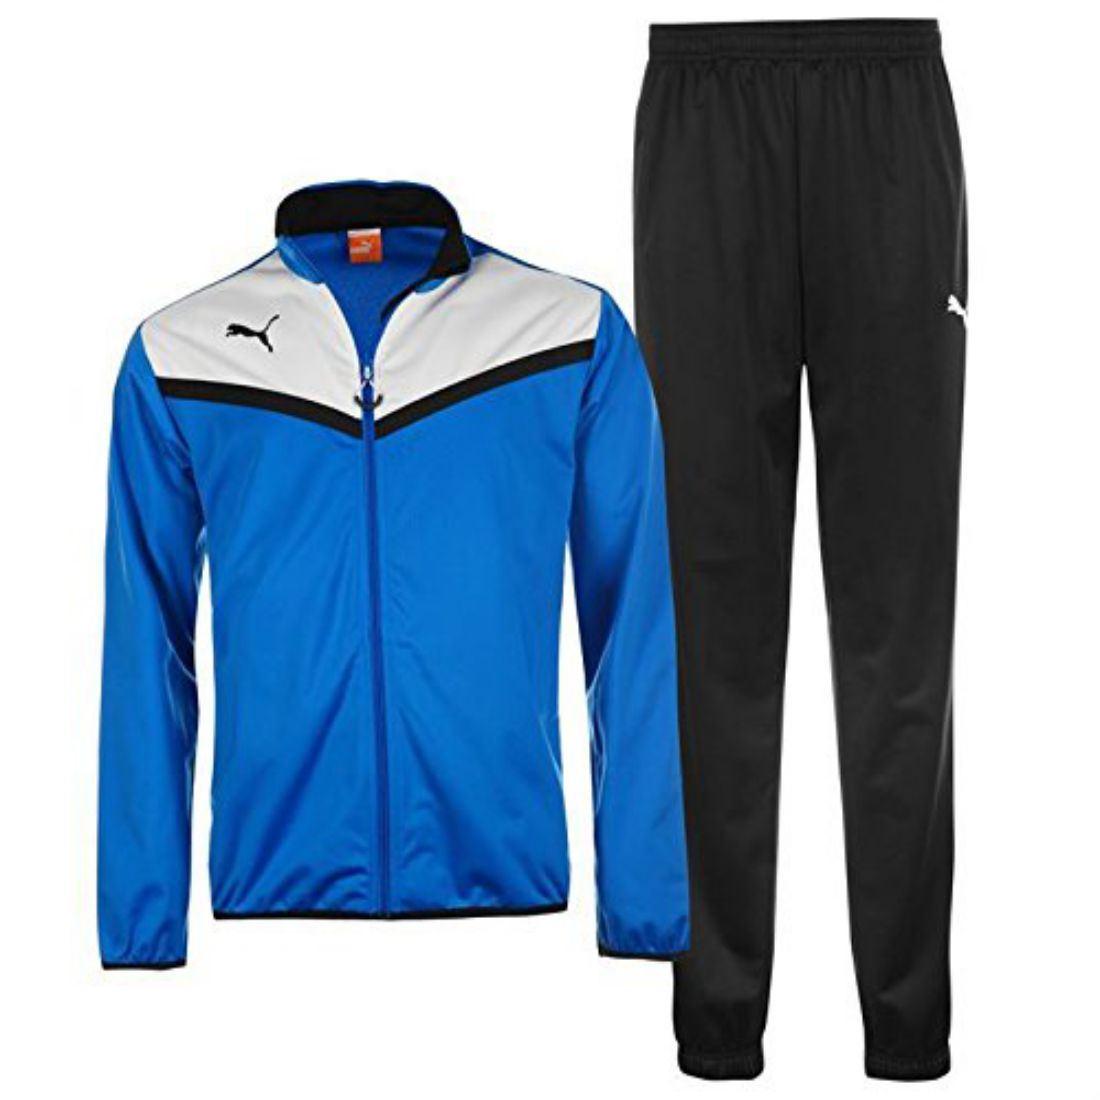 new puma jackets